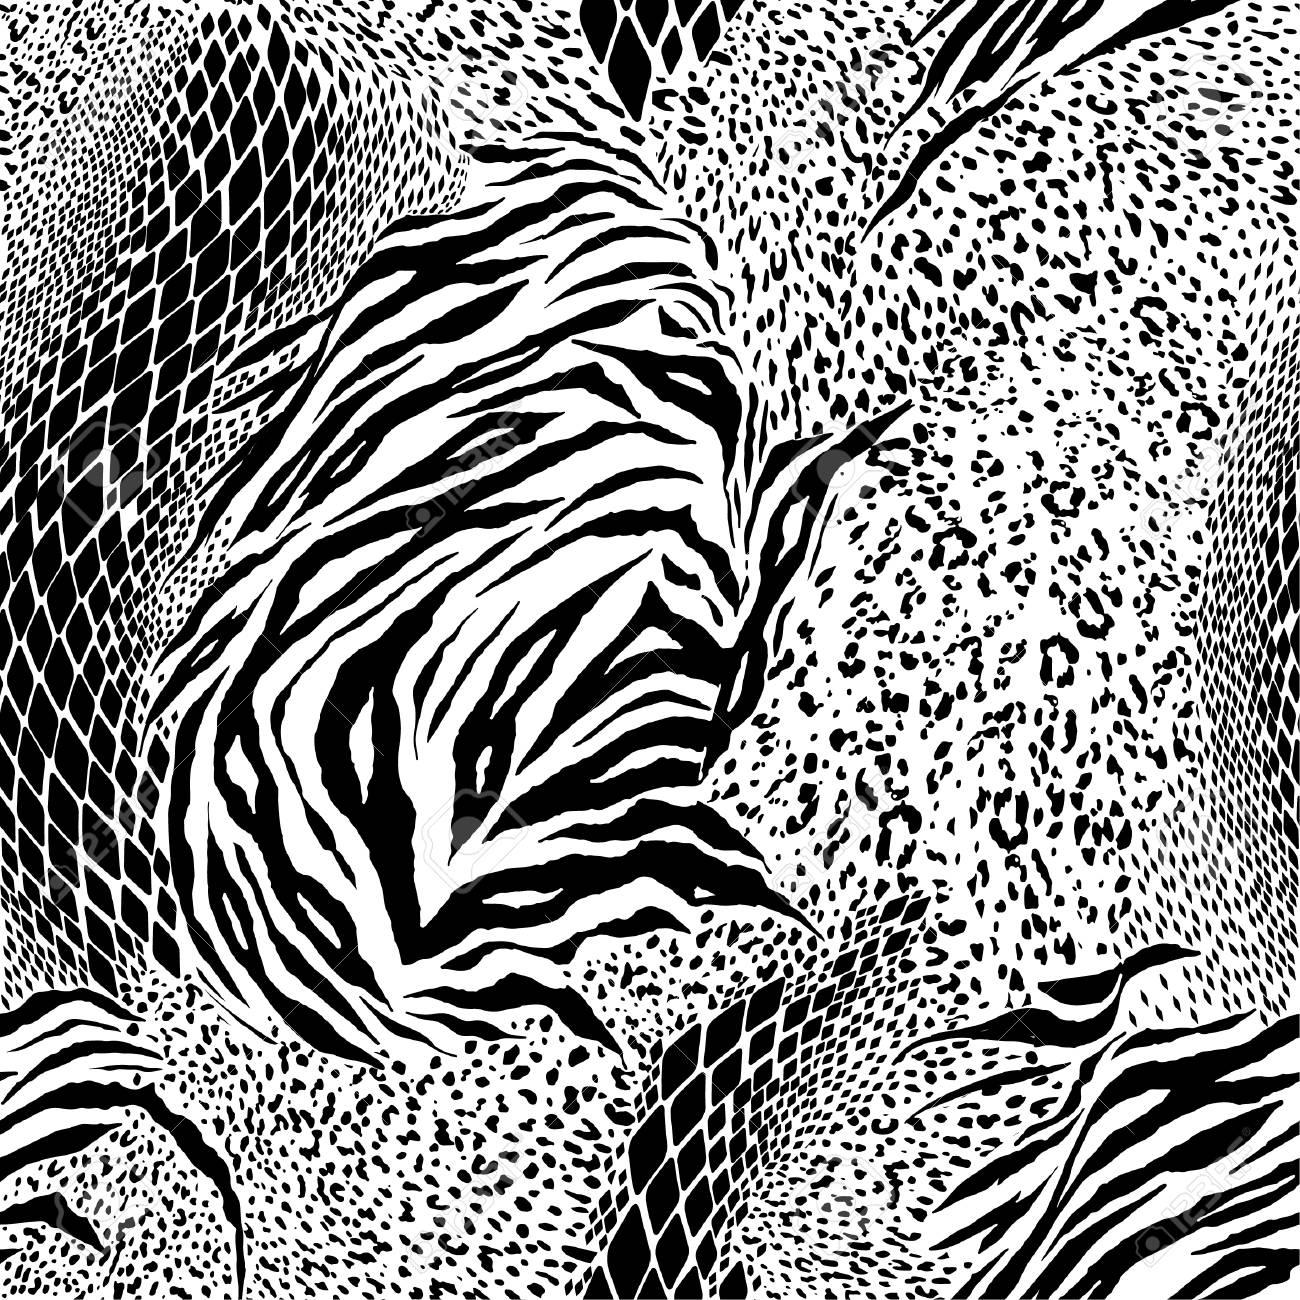 34579fc3a158 Black and white Mixed animal skin,tiger,zebra,leopard,snake, background